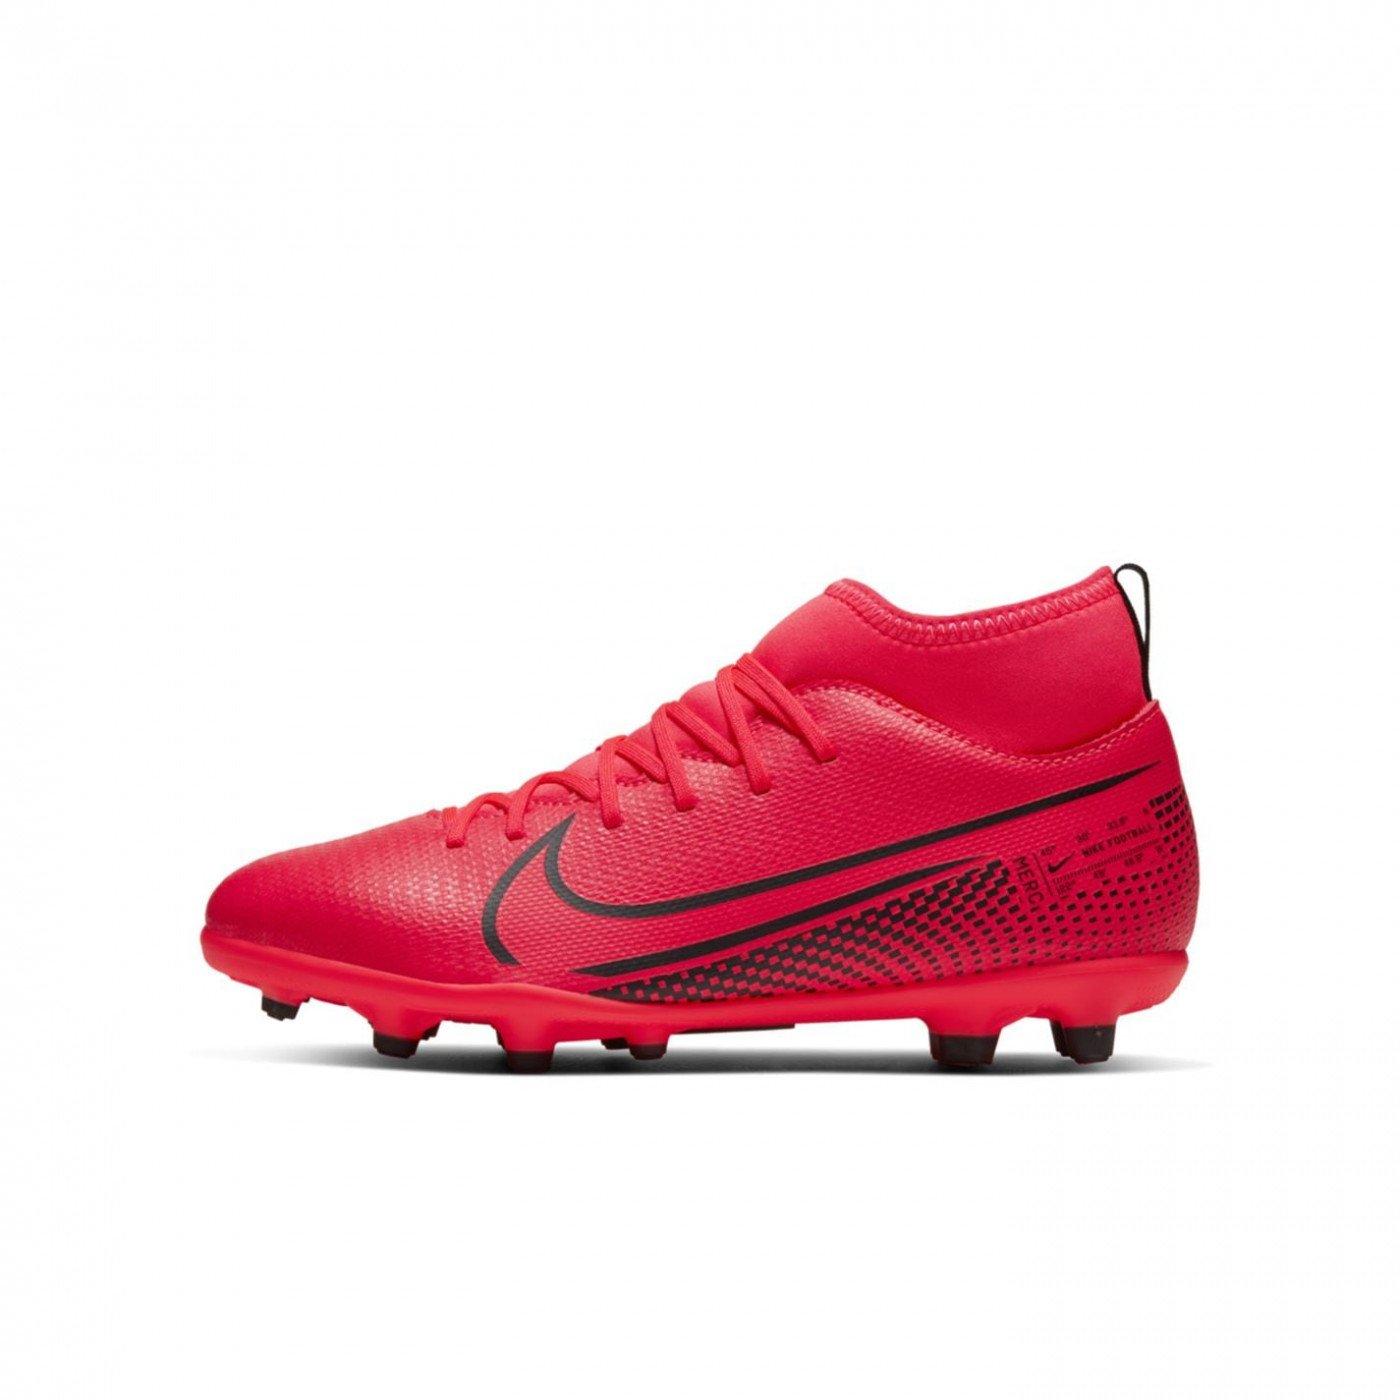 Nike Jr. Mercurial Superfly 7 Club MG Little/Big Kids' Multi-Ground Soccer Cleat